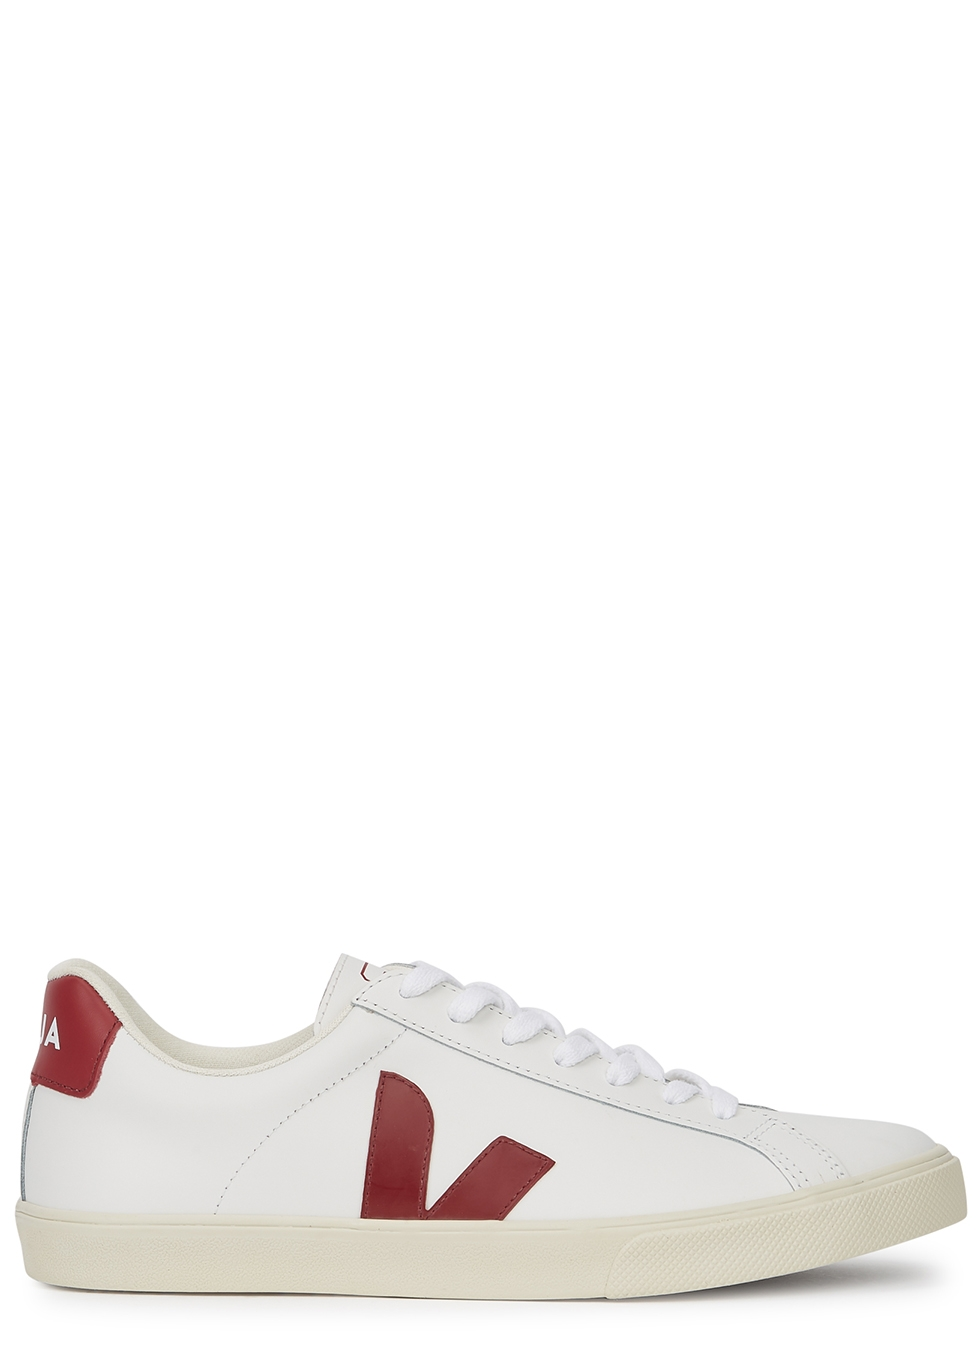 Veja Esplar white leather sneakers